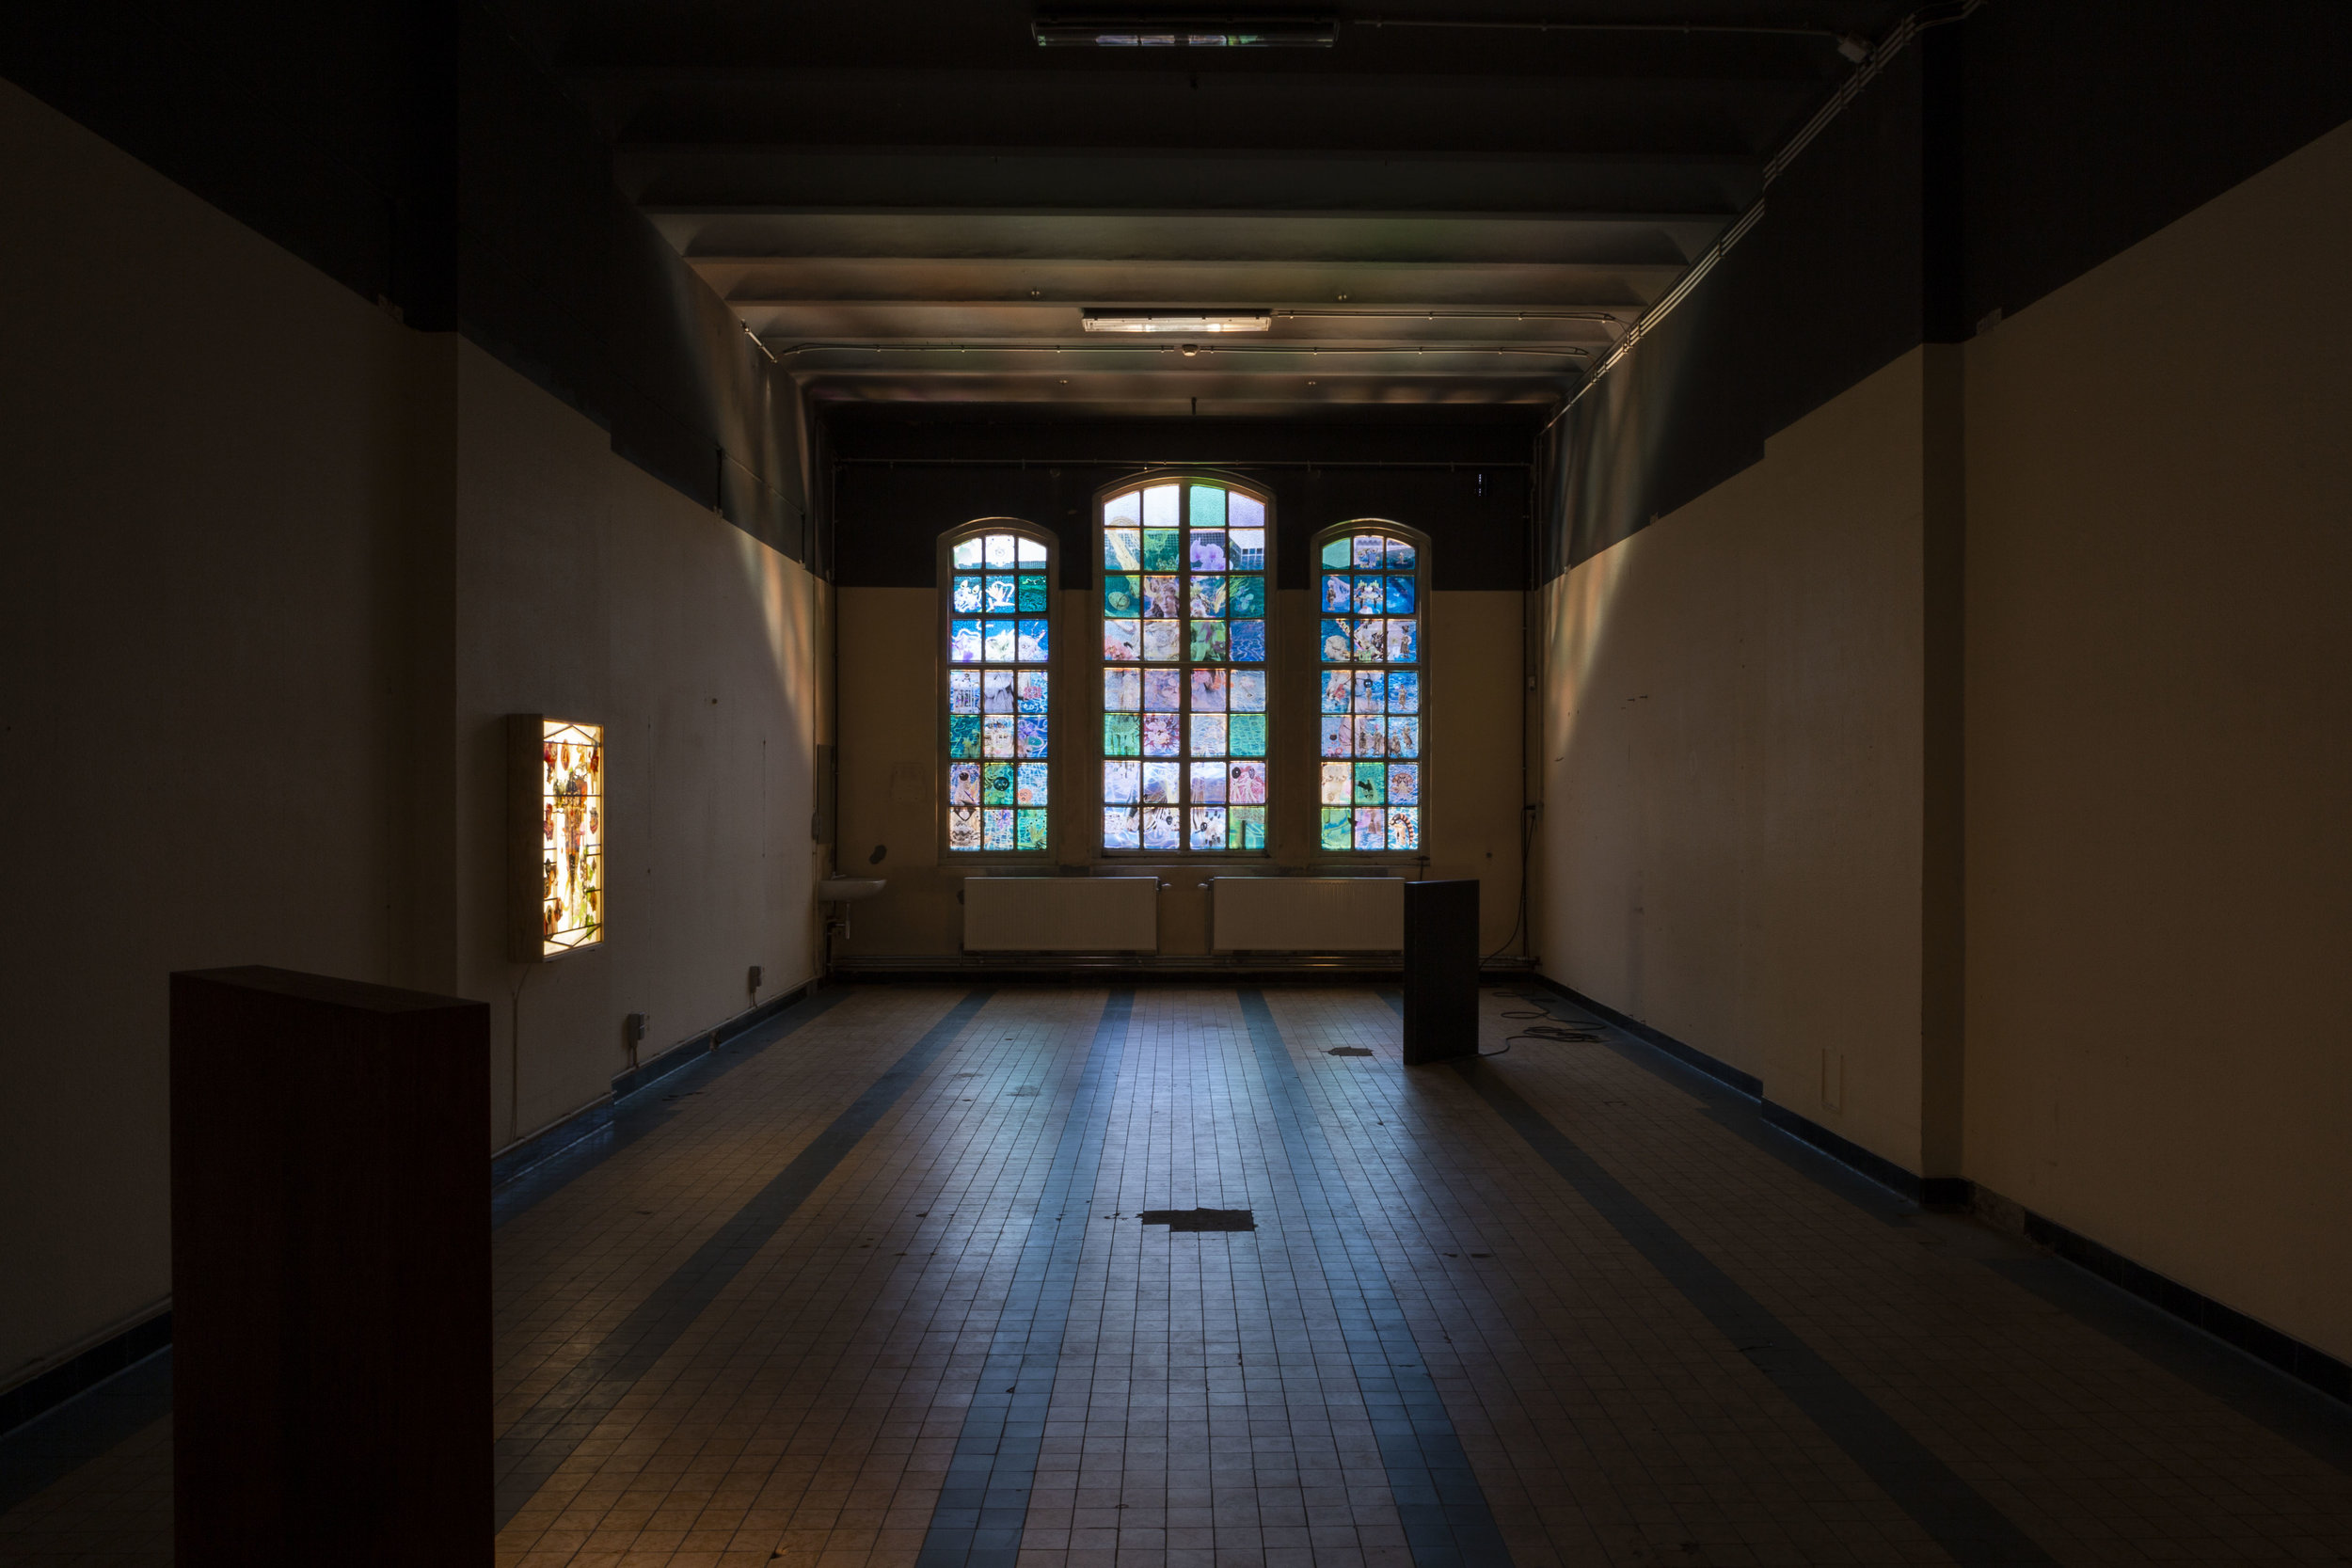 Exhibition view at HISK_Photo©Ingel Vaikla